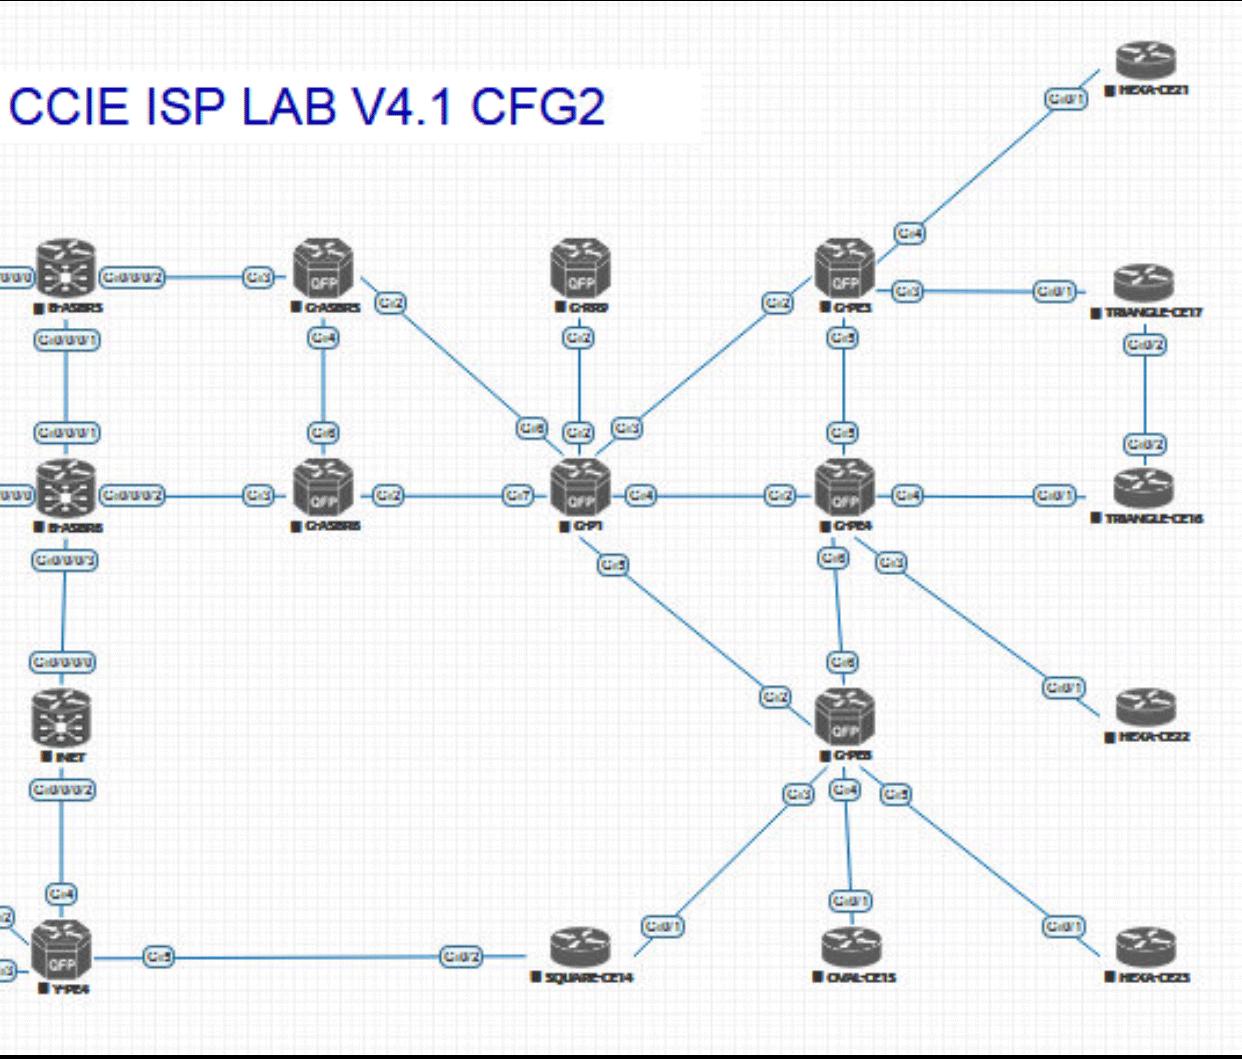 Workbooks ccnp lab workbook : Stable CCIE Service Provider Lab Dumps For Cisco Exam (Scores 900 ...